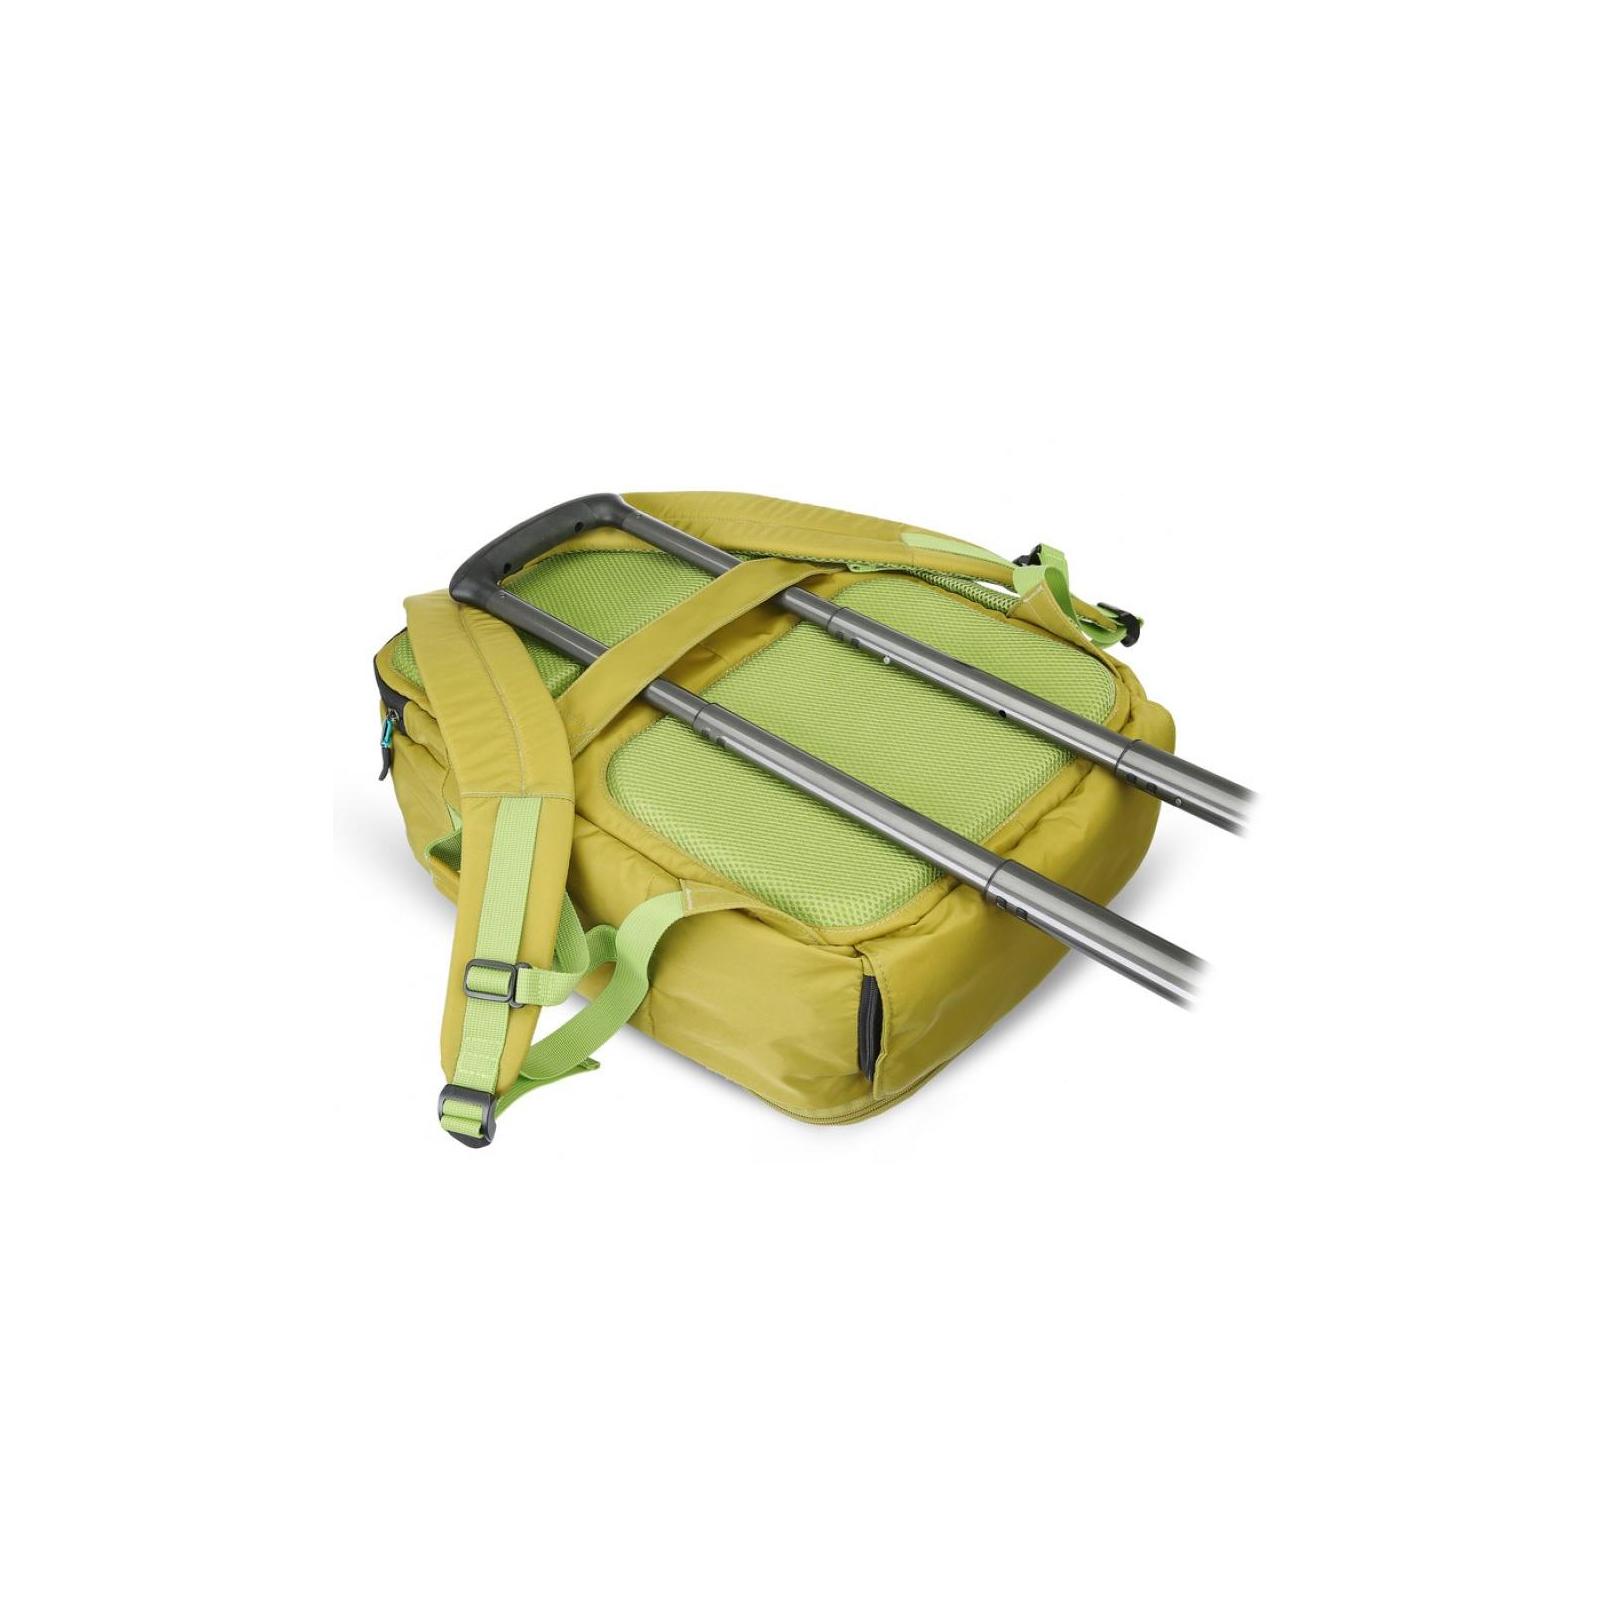 Рюкзак Tucano Sport Mister зелёный (BKMR-V) изображение 8